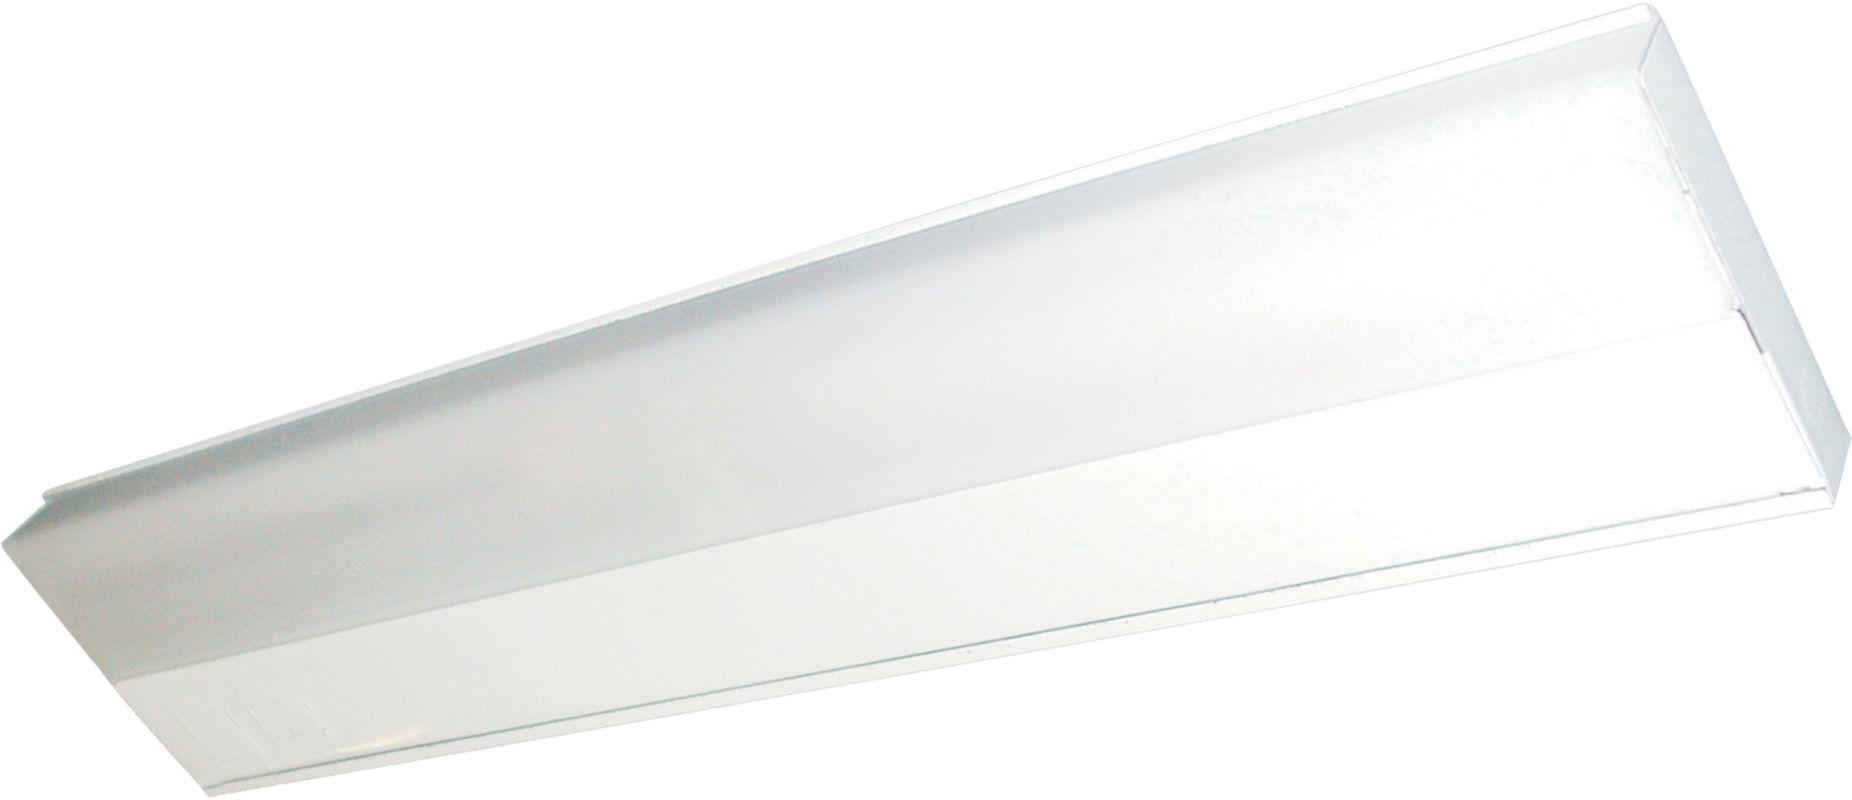 "Maxim 87807 1 Light 24"" Fluorescent Under Cabinet Light from the"